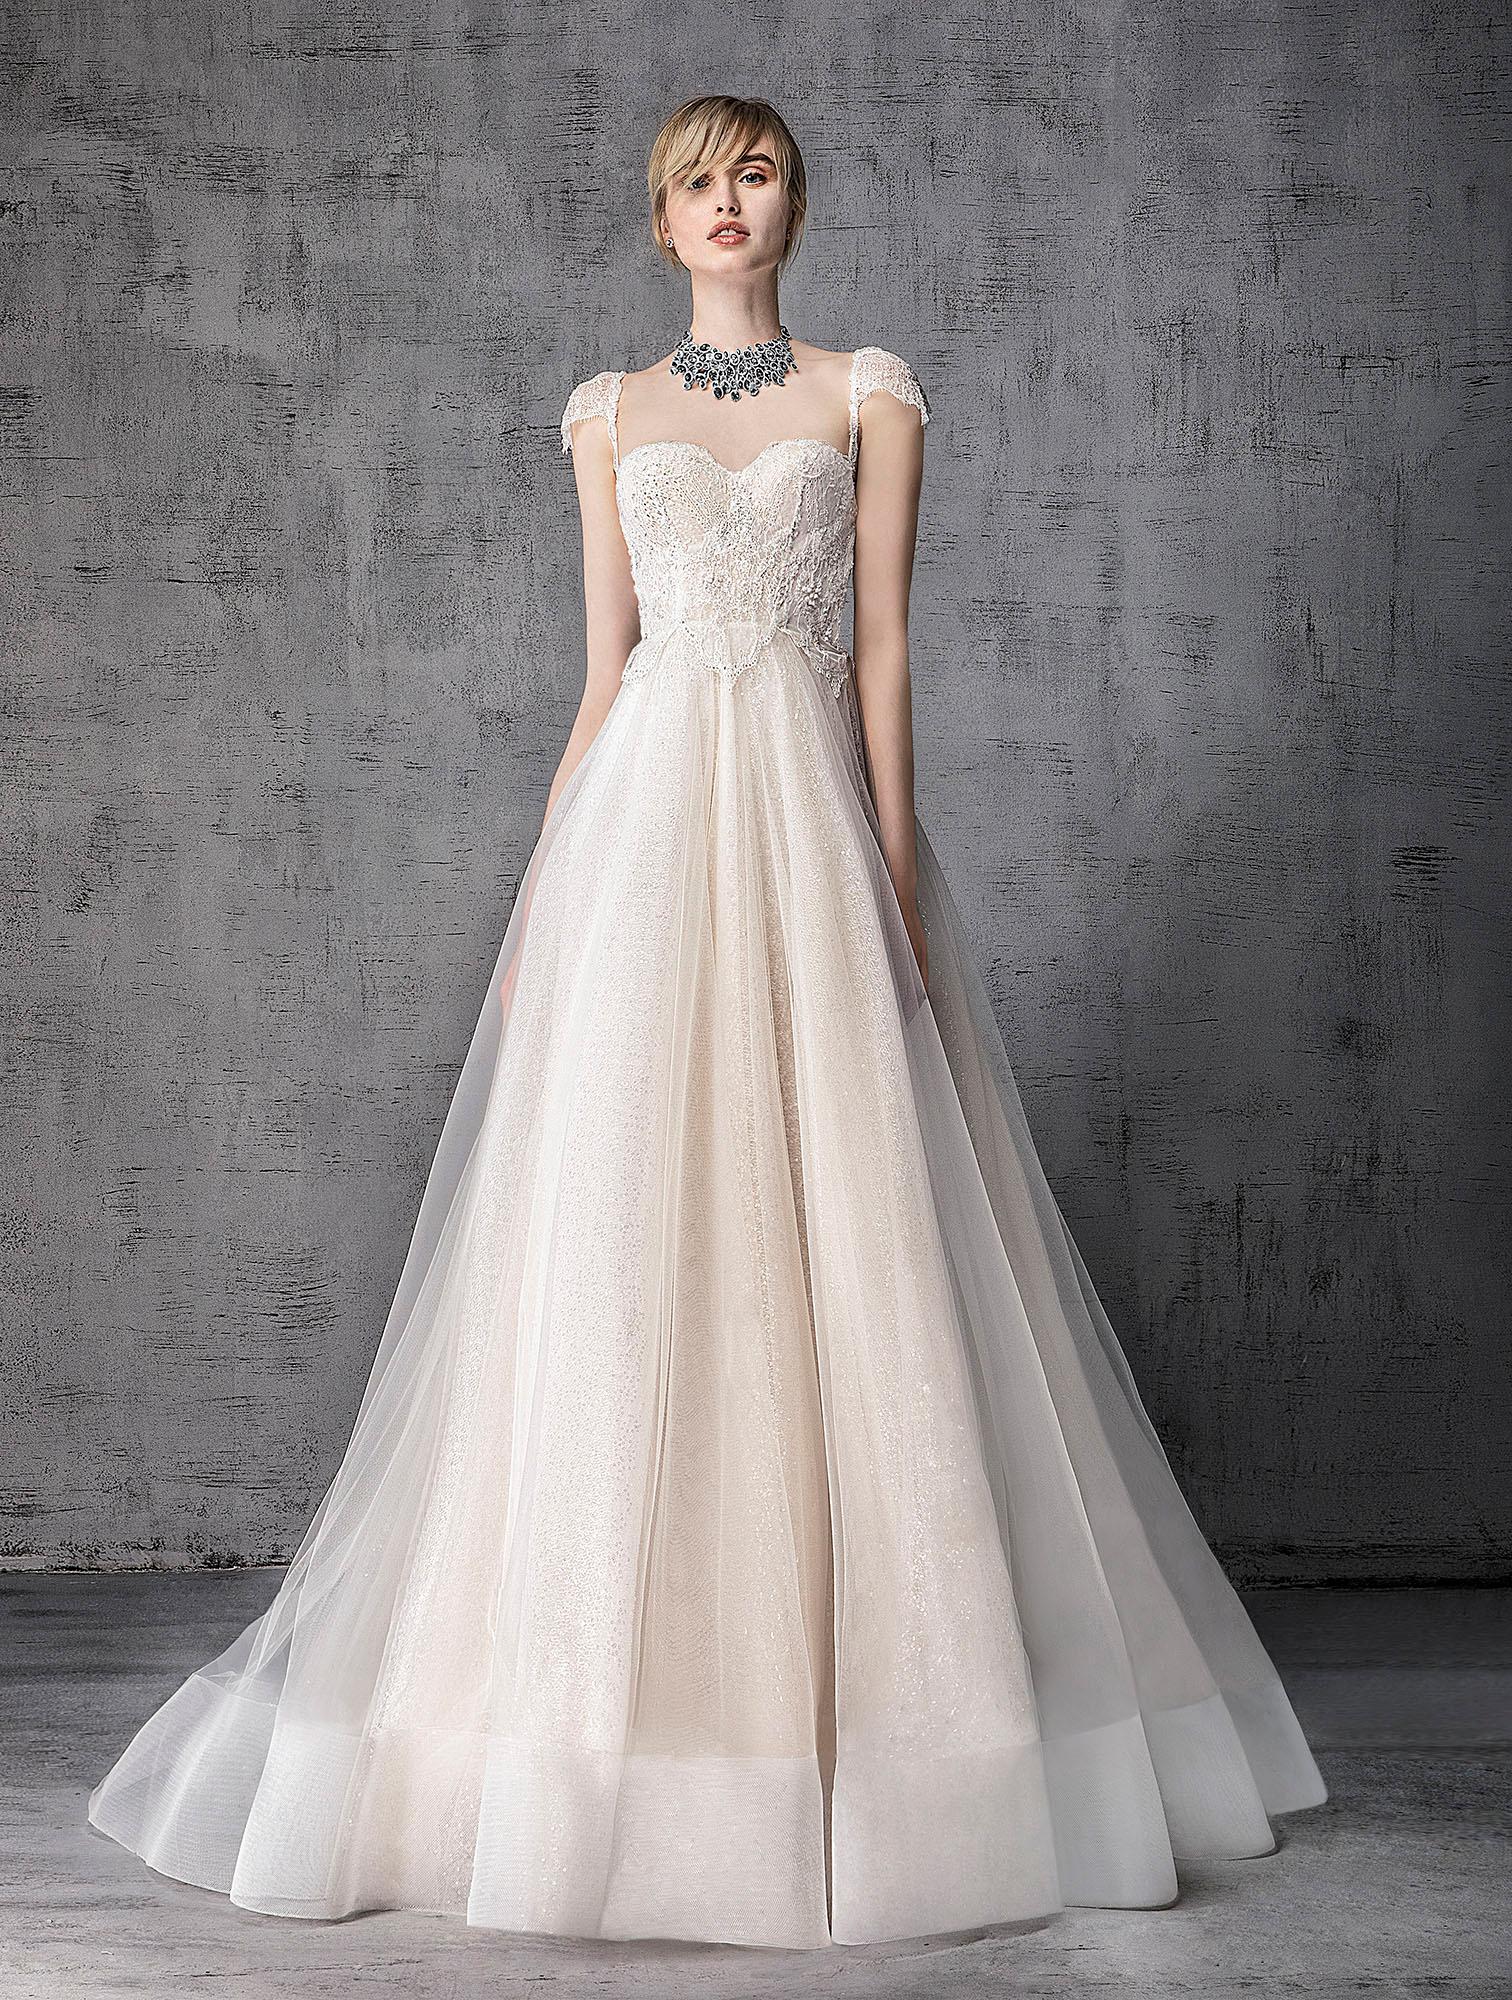 victoria kyriakides wedding dress spring 2019 sweetheart cap-sleeve a-line